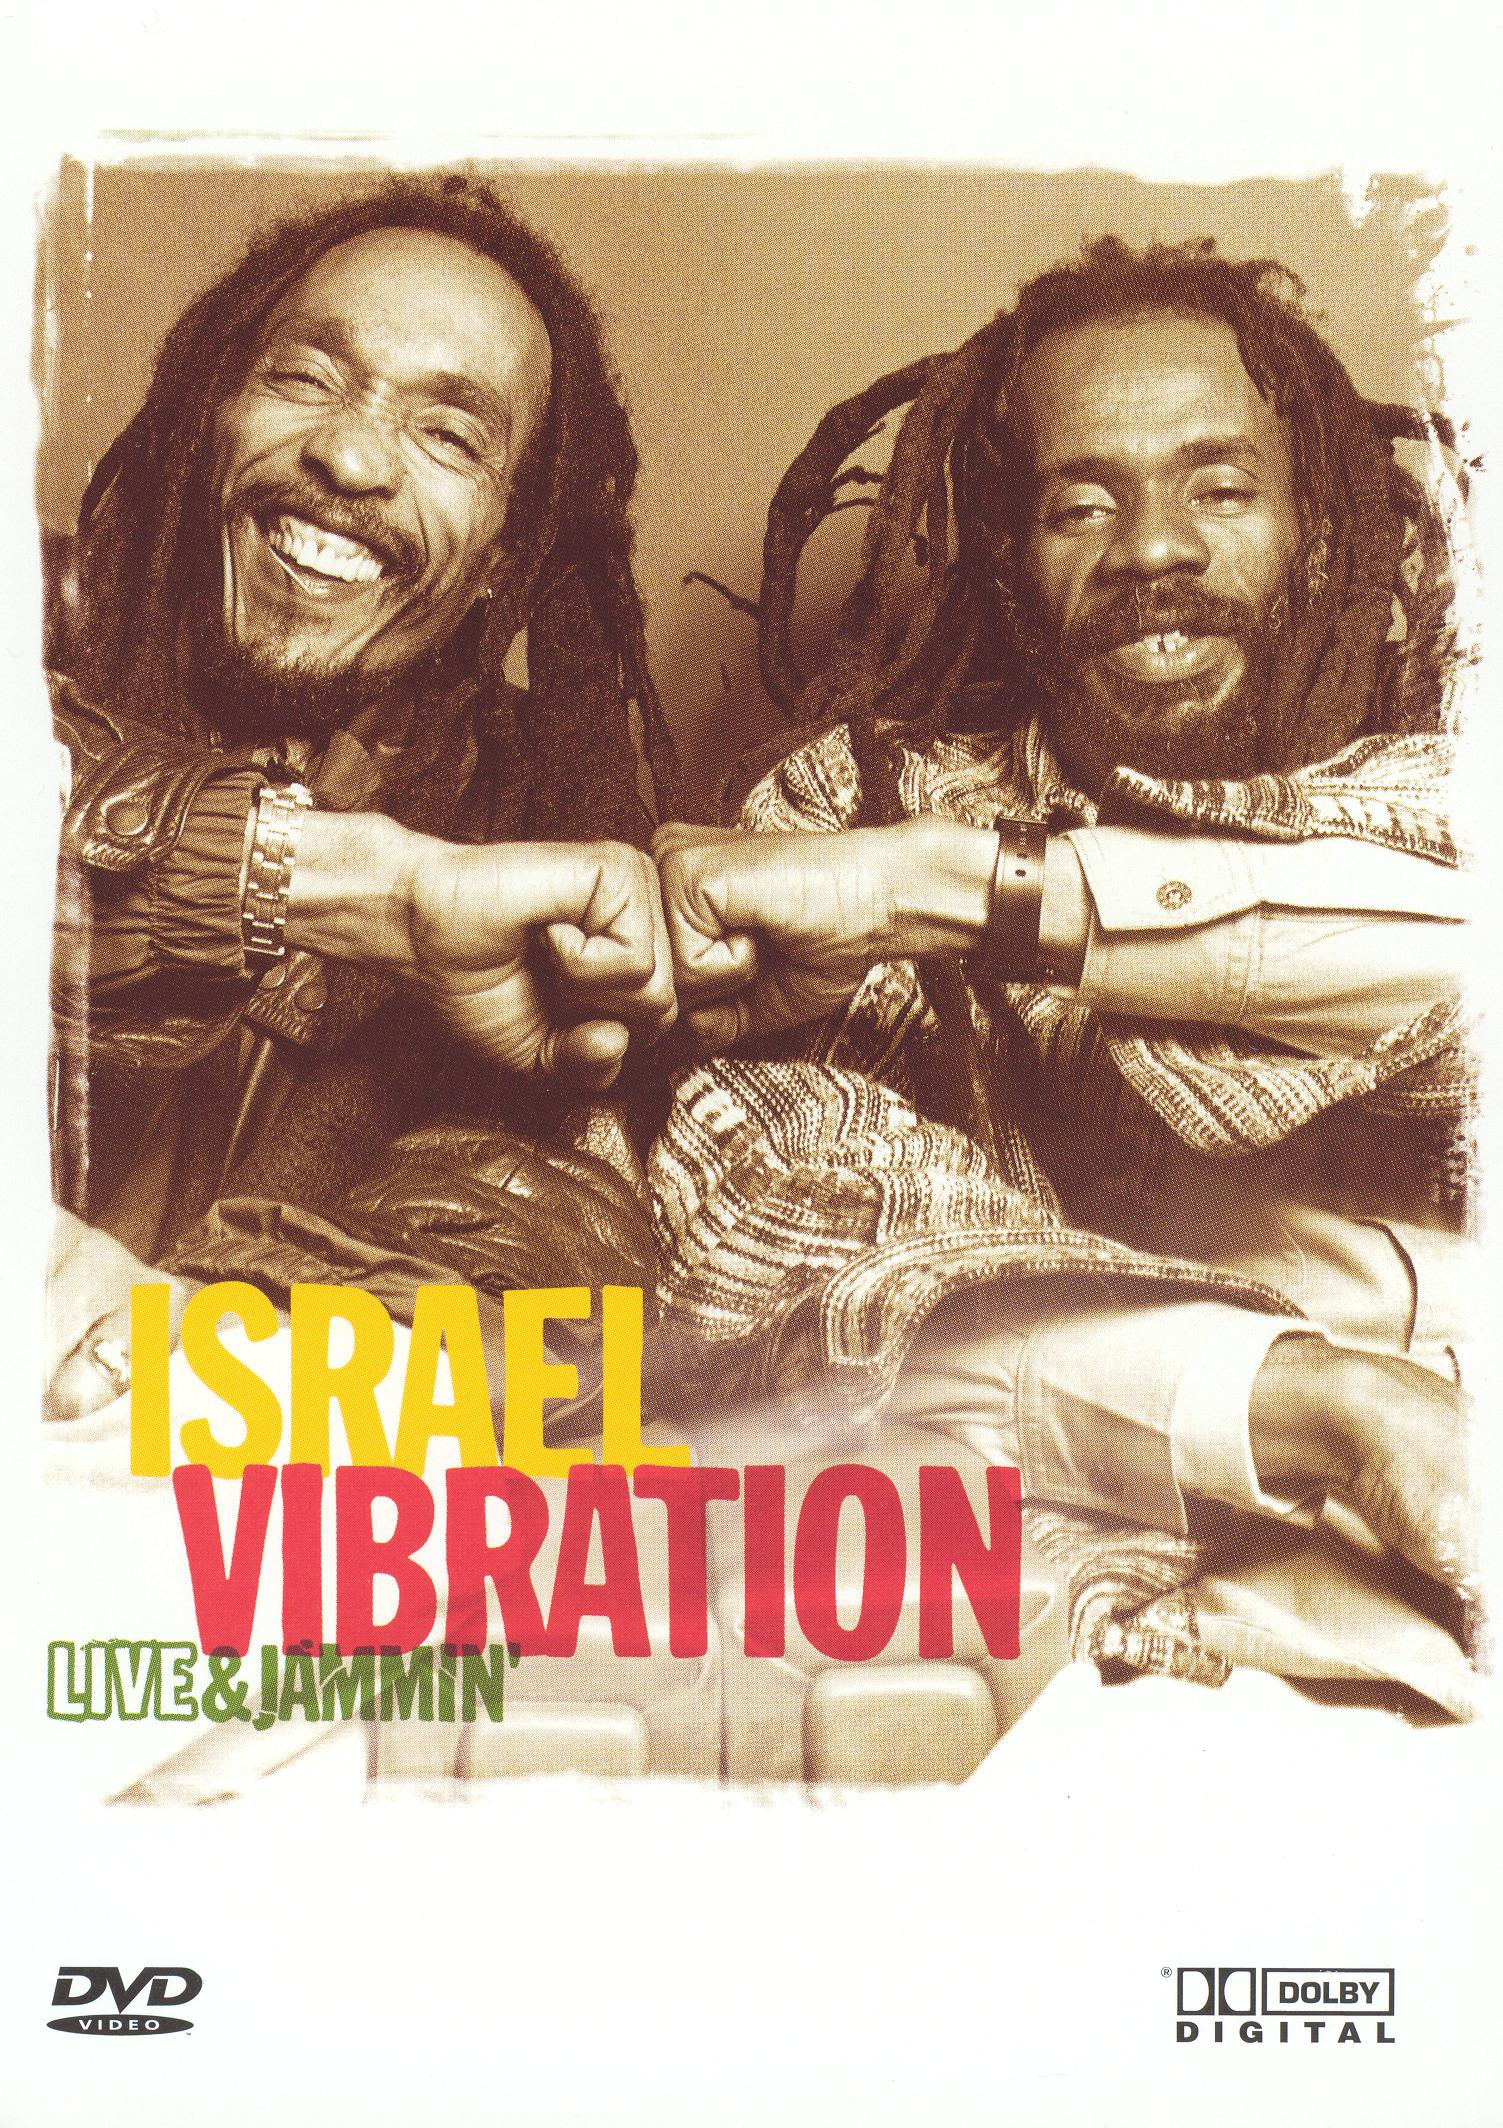 Israel Vibration: Live & Jammin'